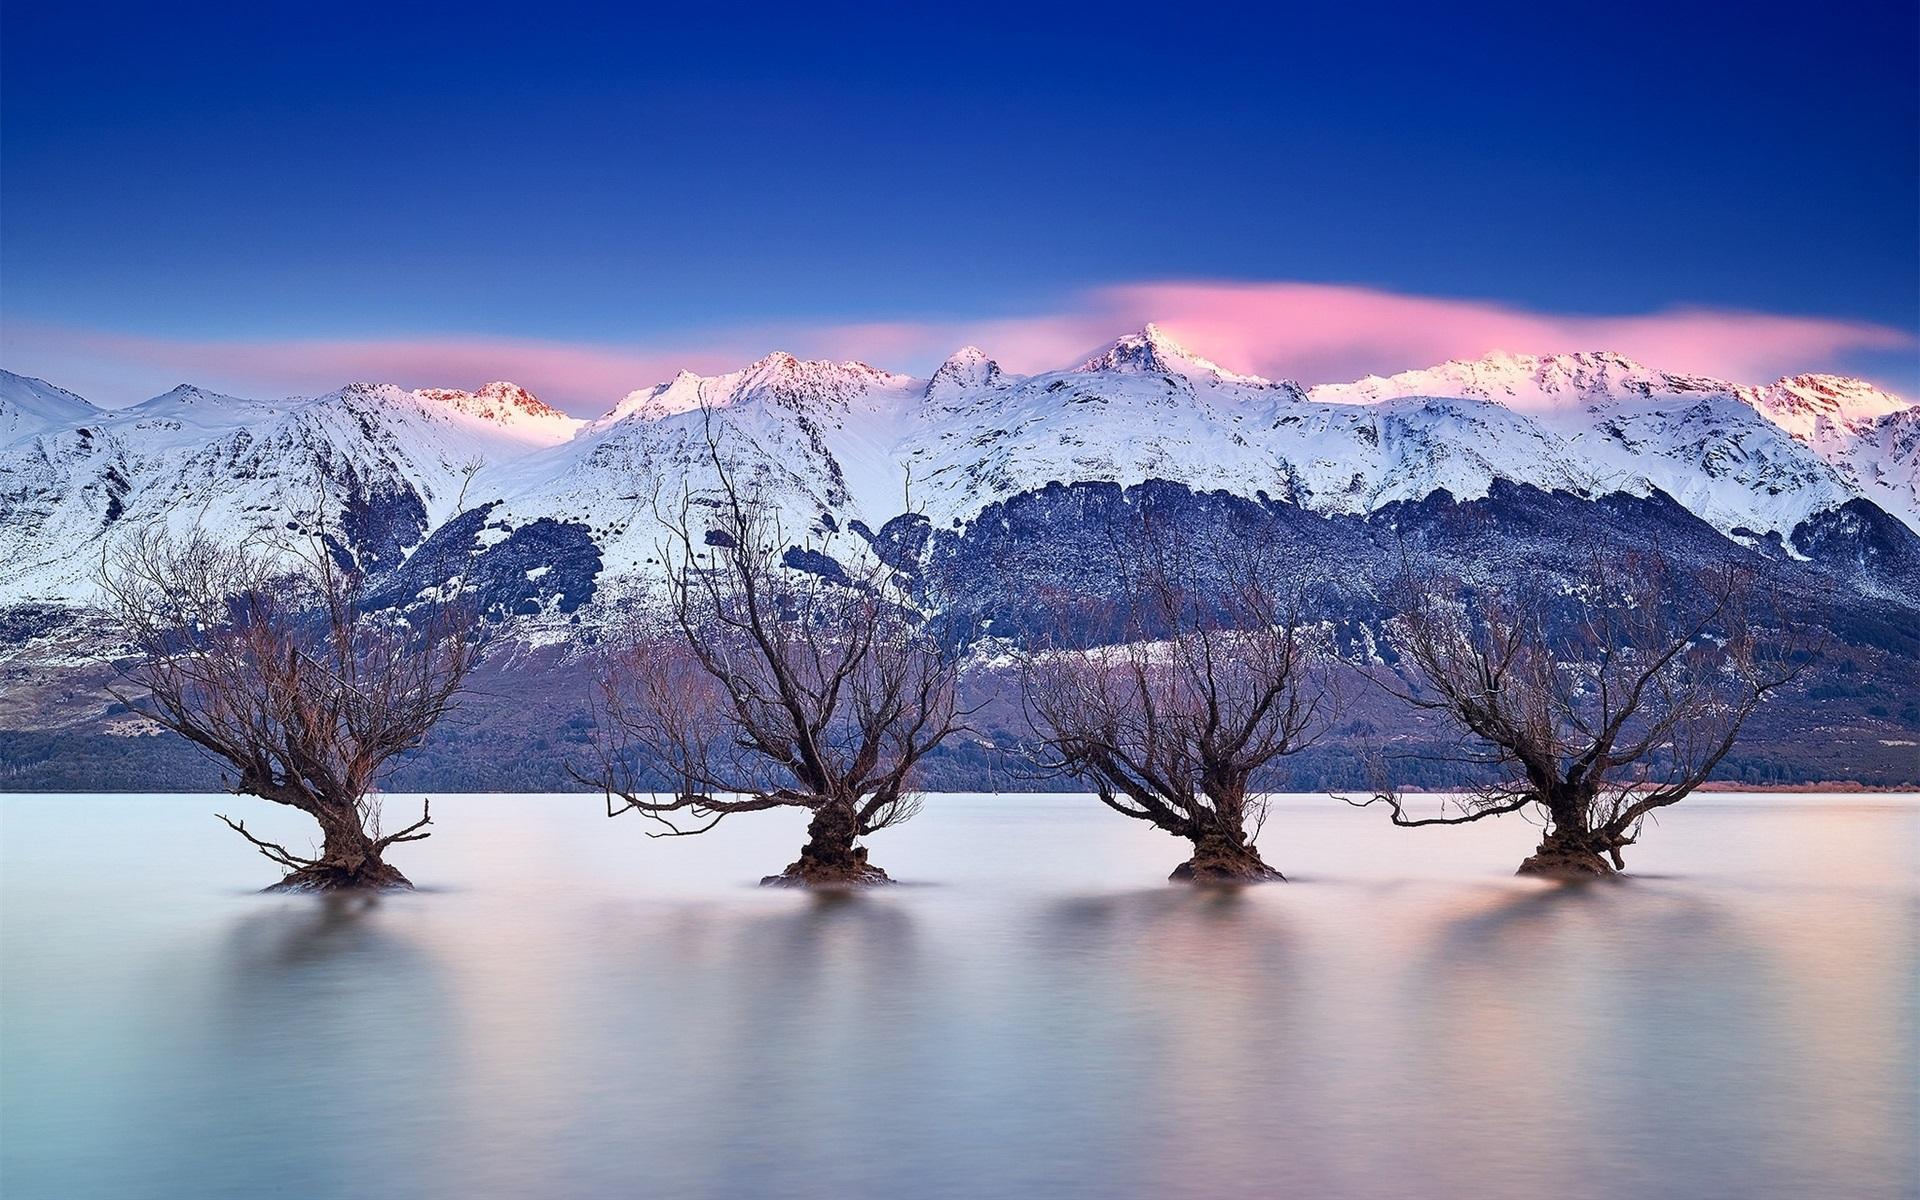 Wallpaper Lake Wakatipu, Queenstown, New Zealand, Southern Alps, Trees 1920X1200 Hd -7751